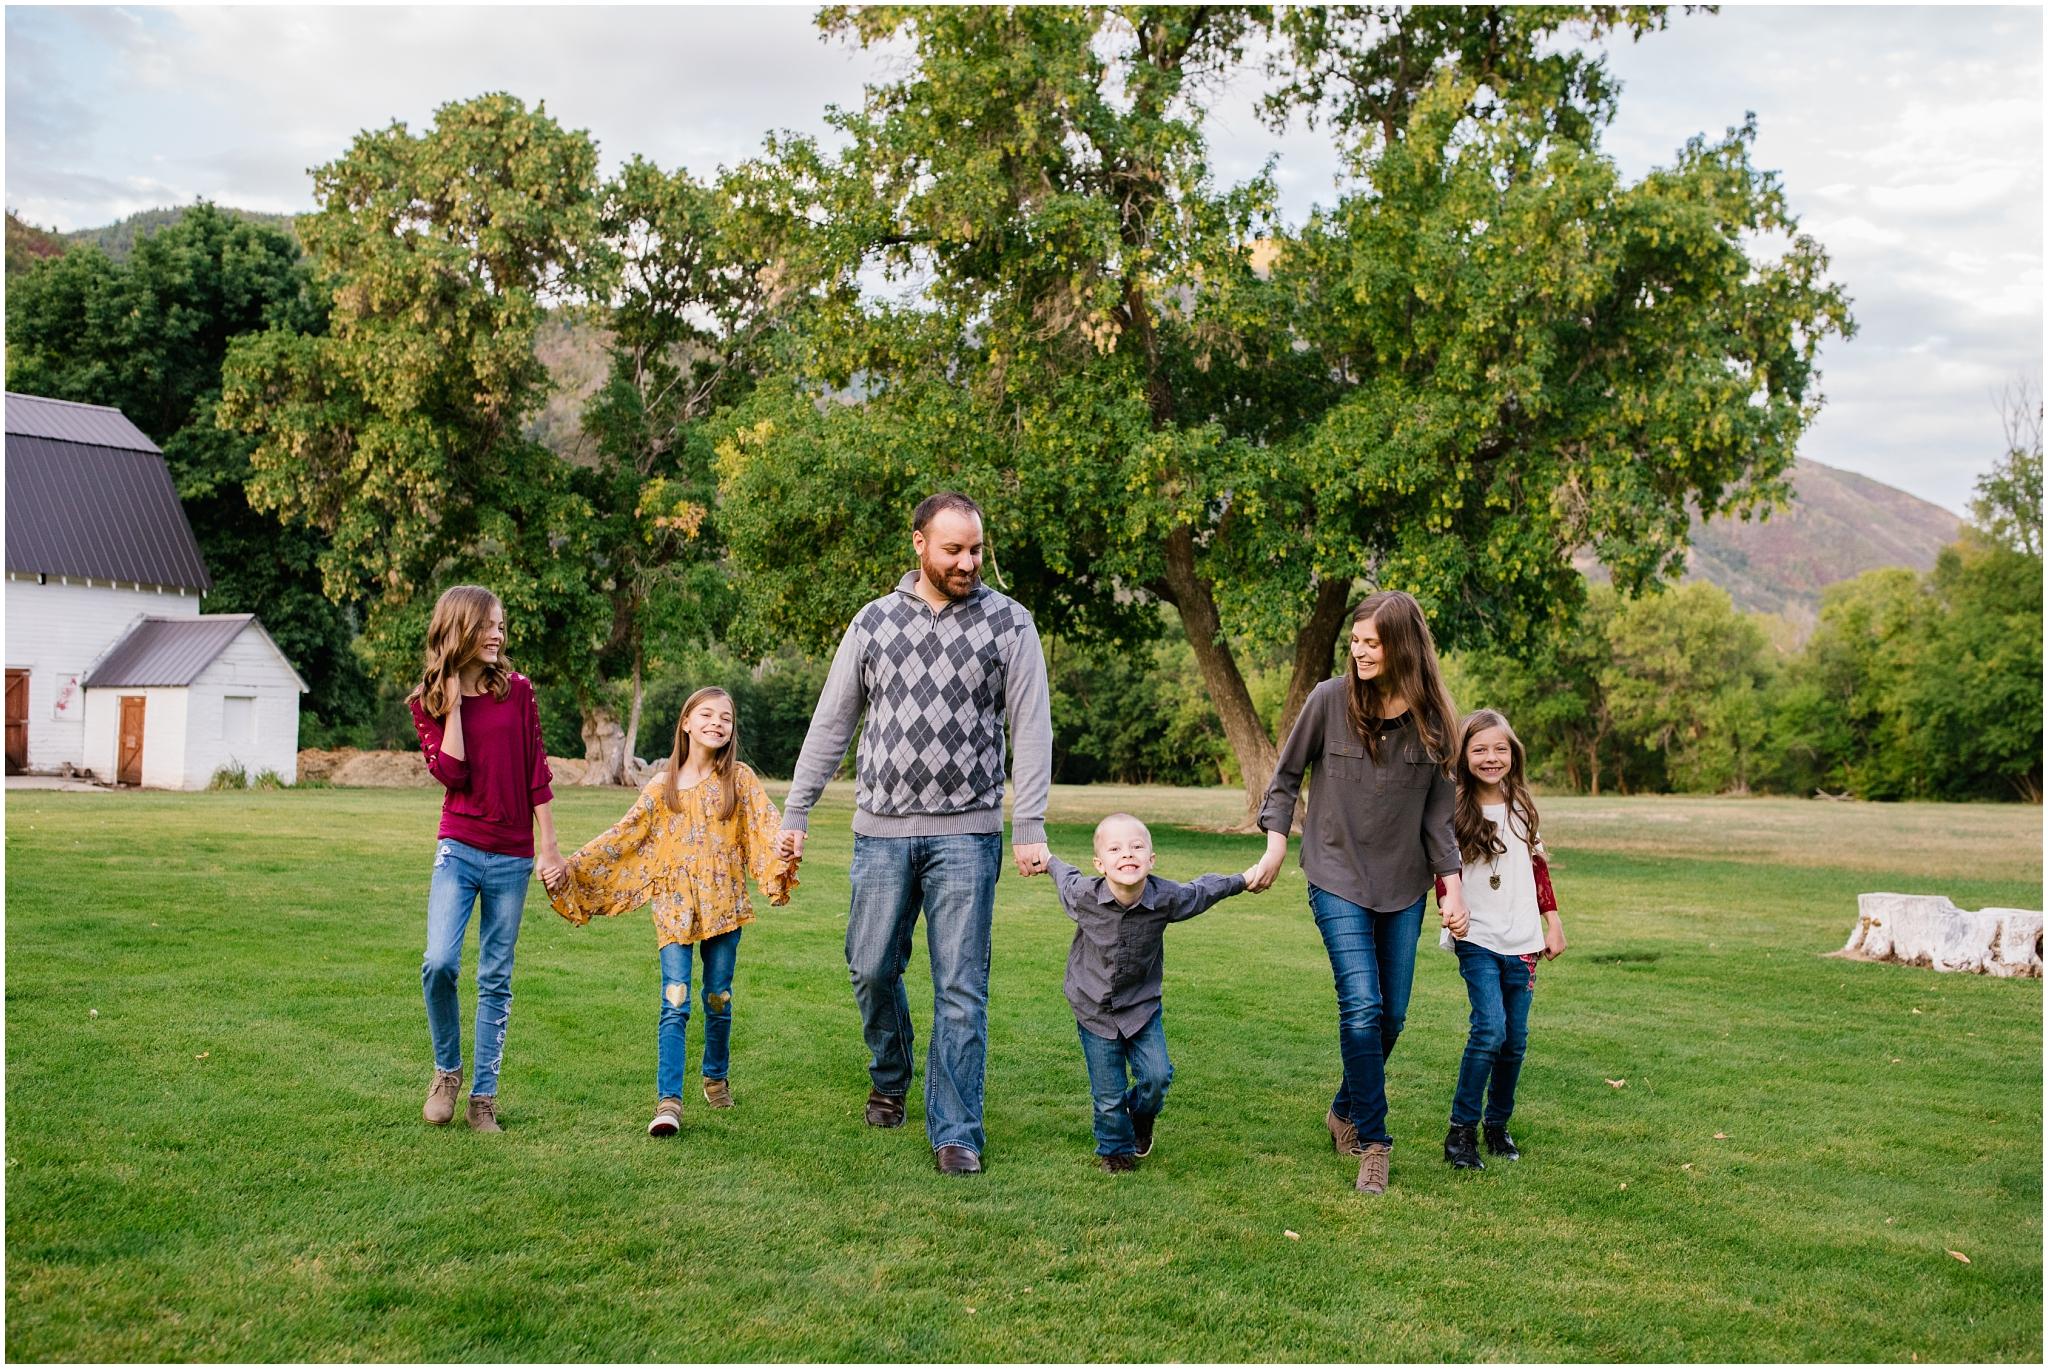 Hurst-3_Lizzie-B-Imagery-Utah-Family-Photographer-Hobble-Creek-Canyon-Jolleys-Ranch-Utah-County.jpg